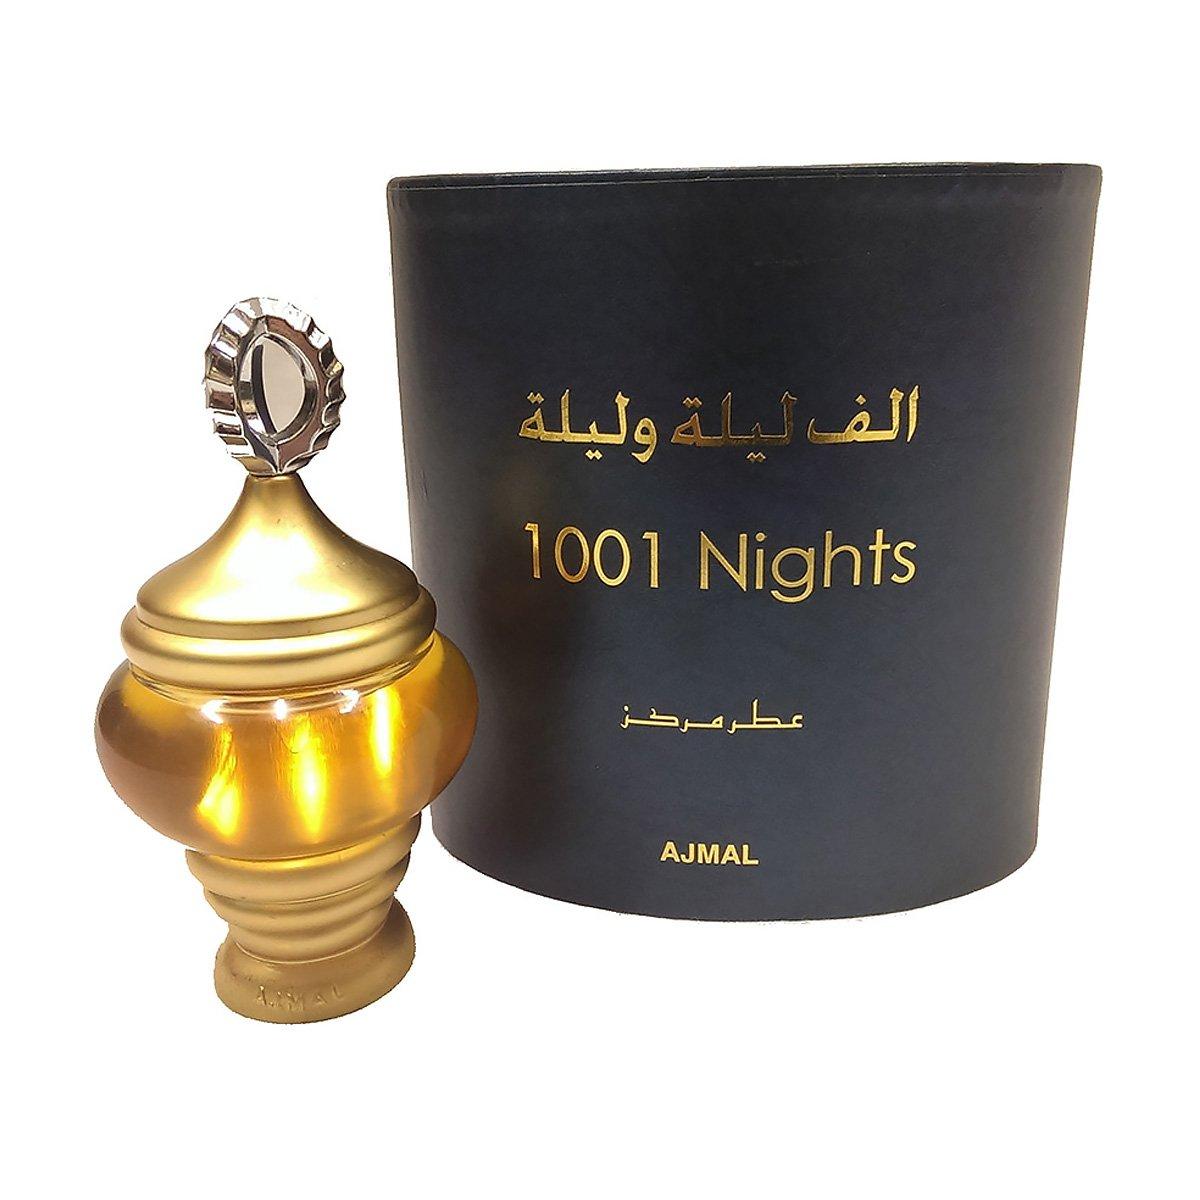 Ajmal 1001 Nights 60ml edp